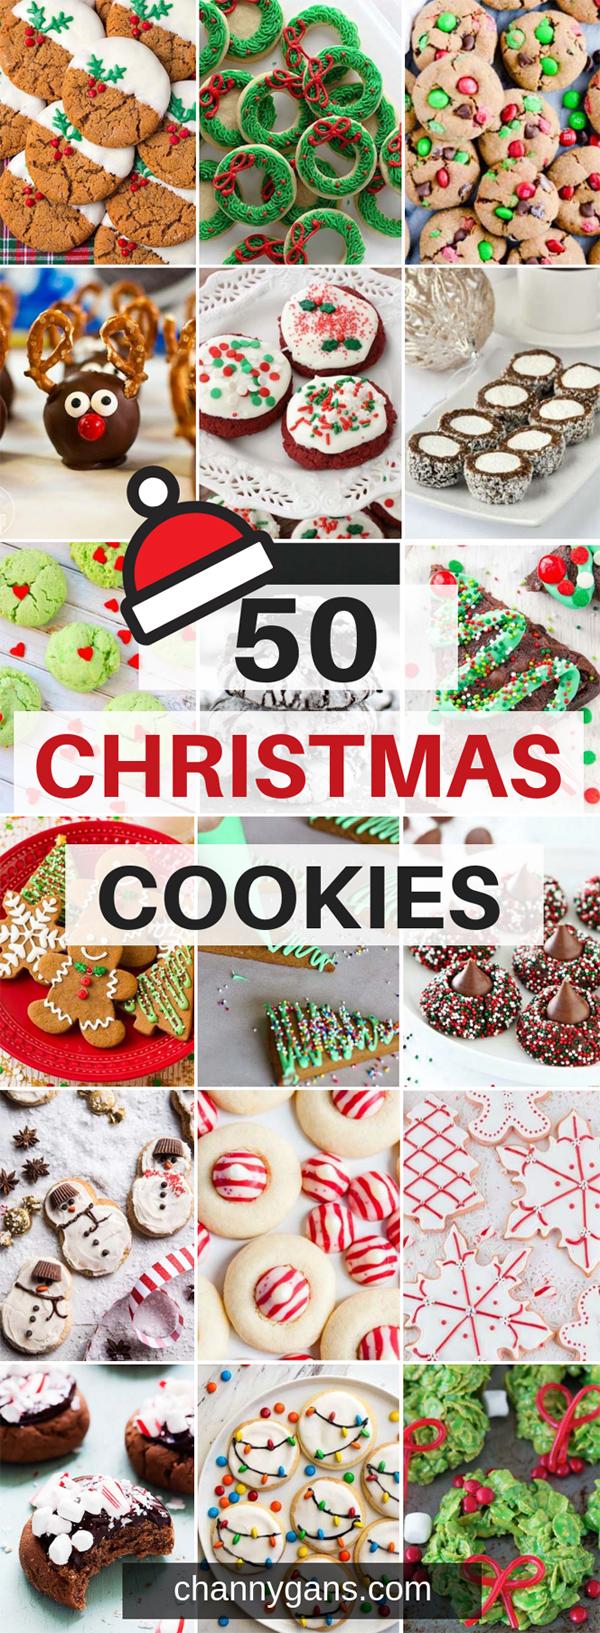 50 Christmas cookies